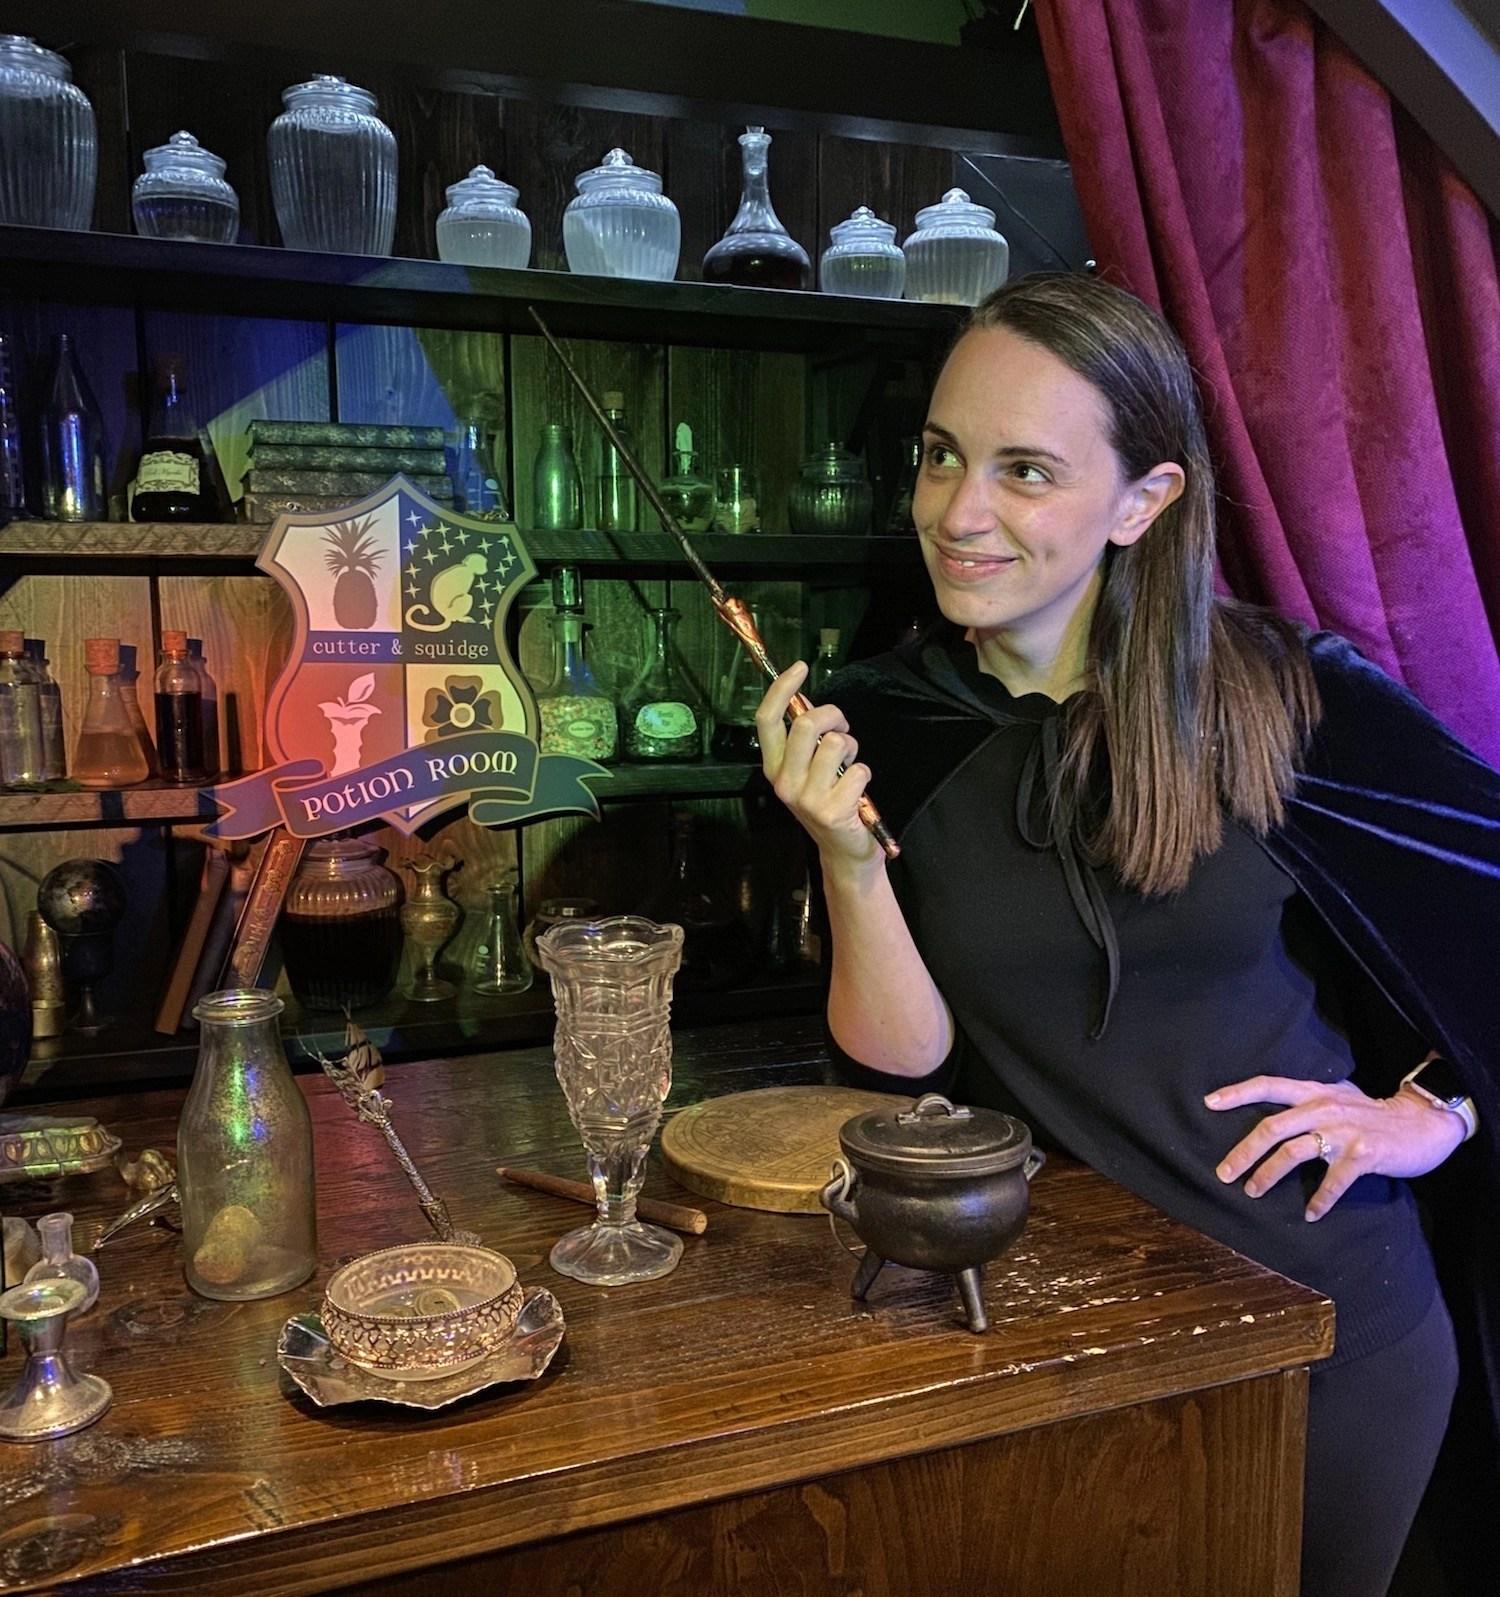 Harry Potter Bucket List London - Afternoon Tea